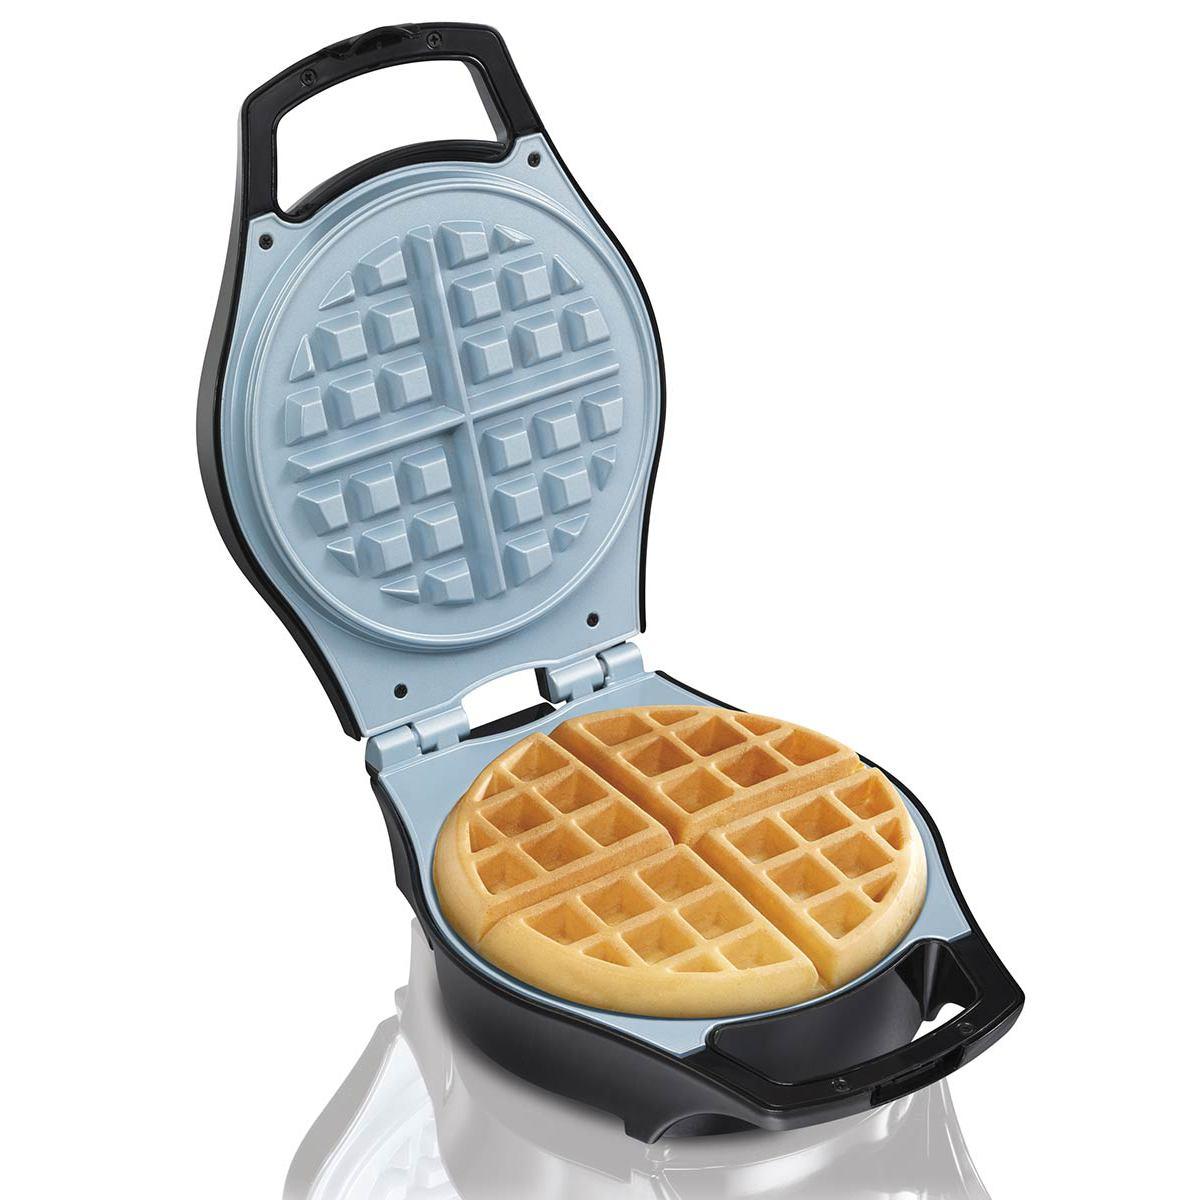 Durathon® Mess-Free Belgian Style Waffle Maker (26043)